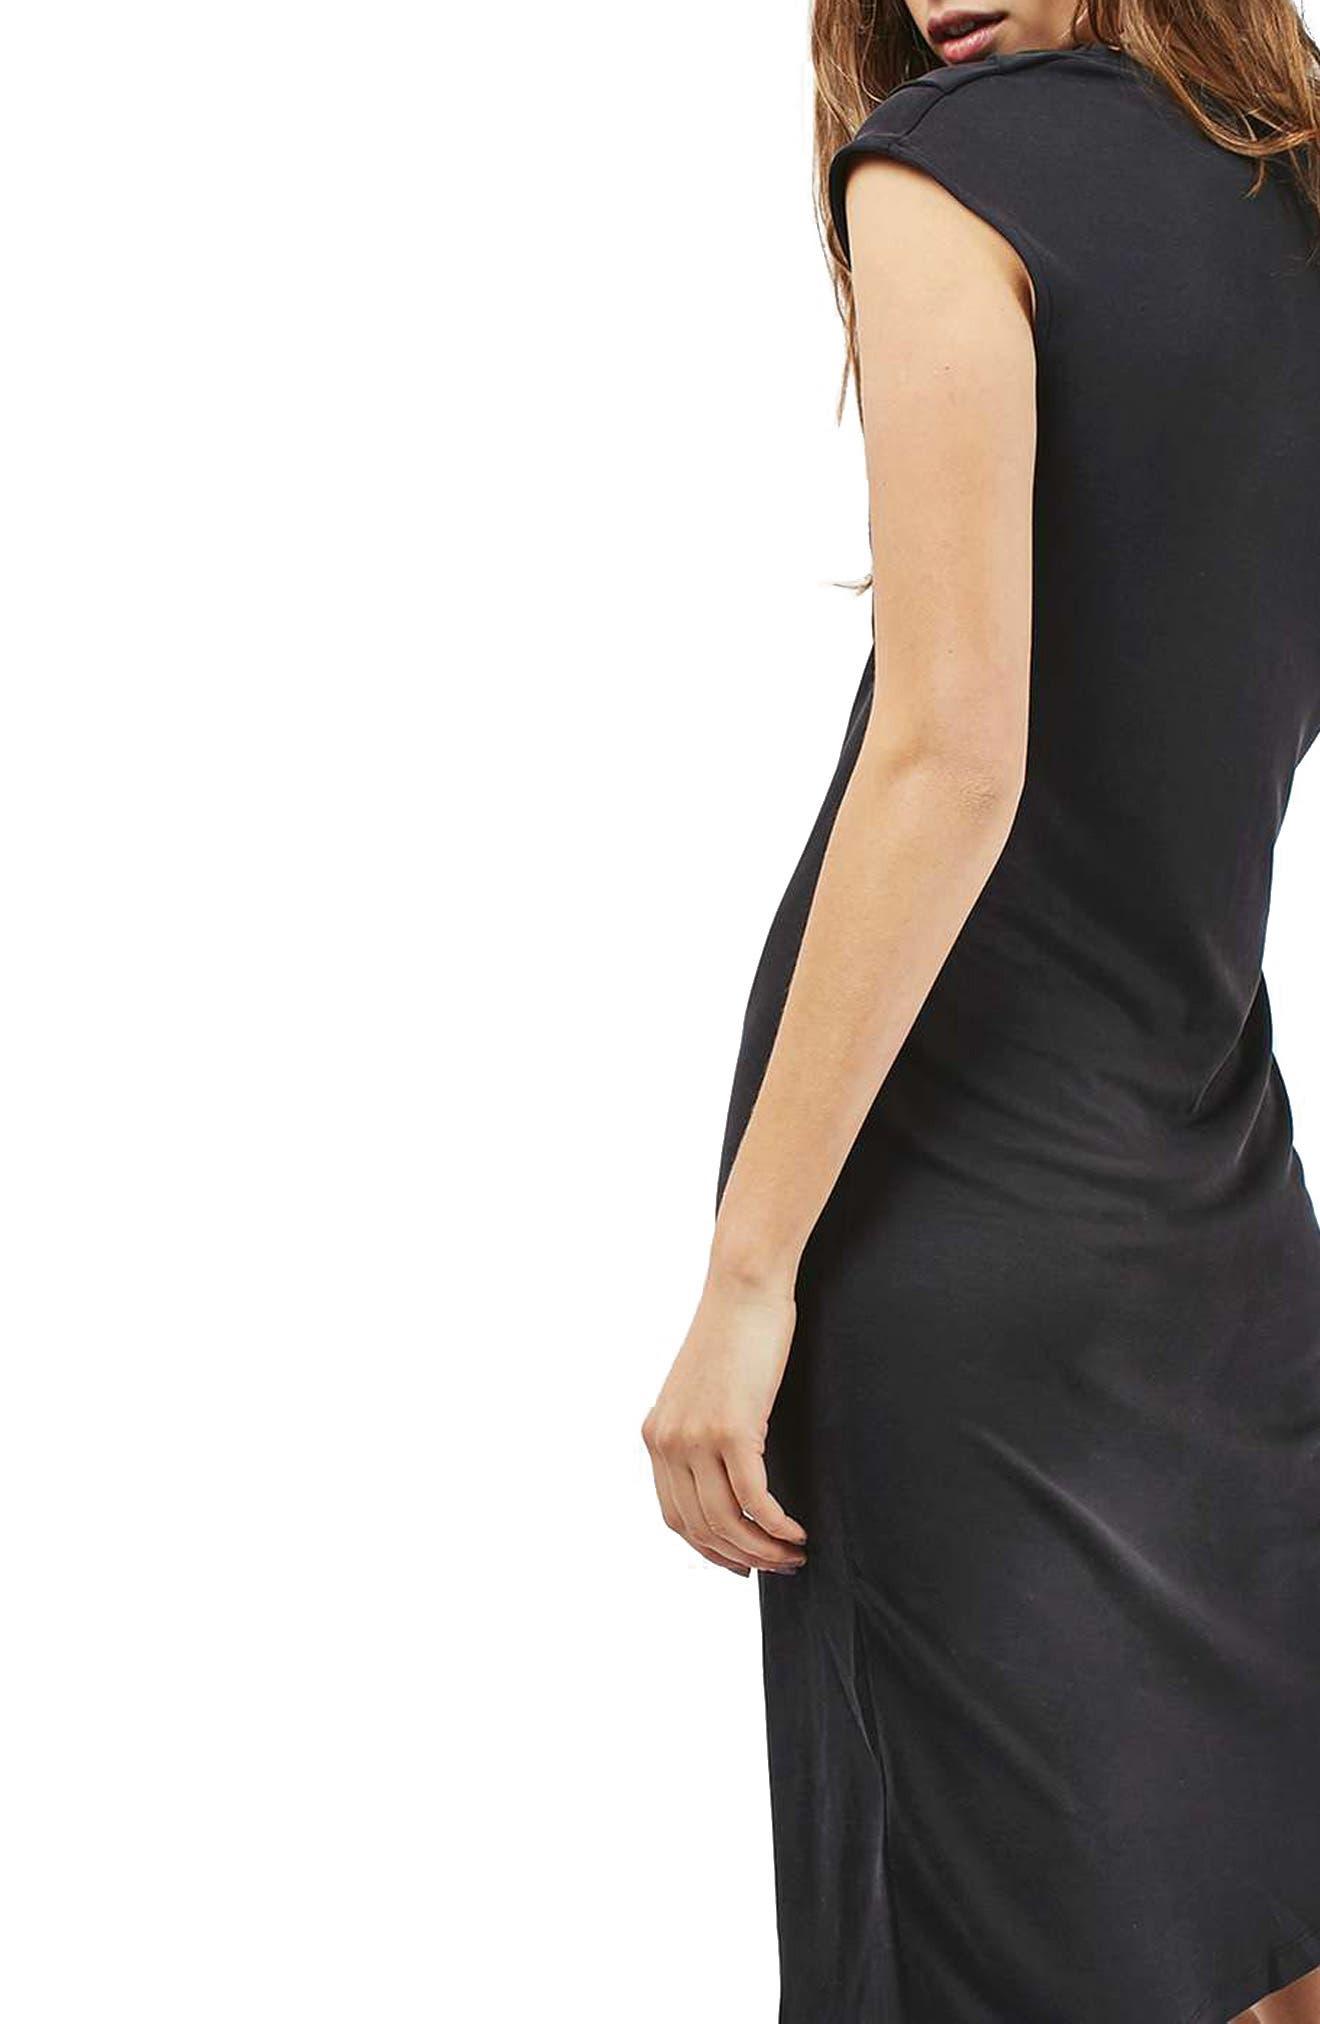 TOPSHOP, Asymmetric Slinky Drape Dress, Main thumbnail 1, color, 001